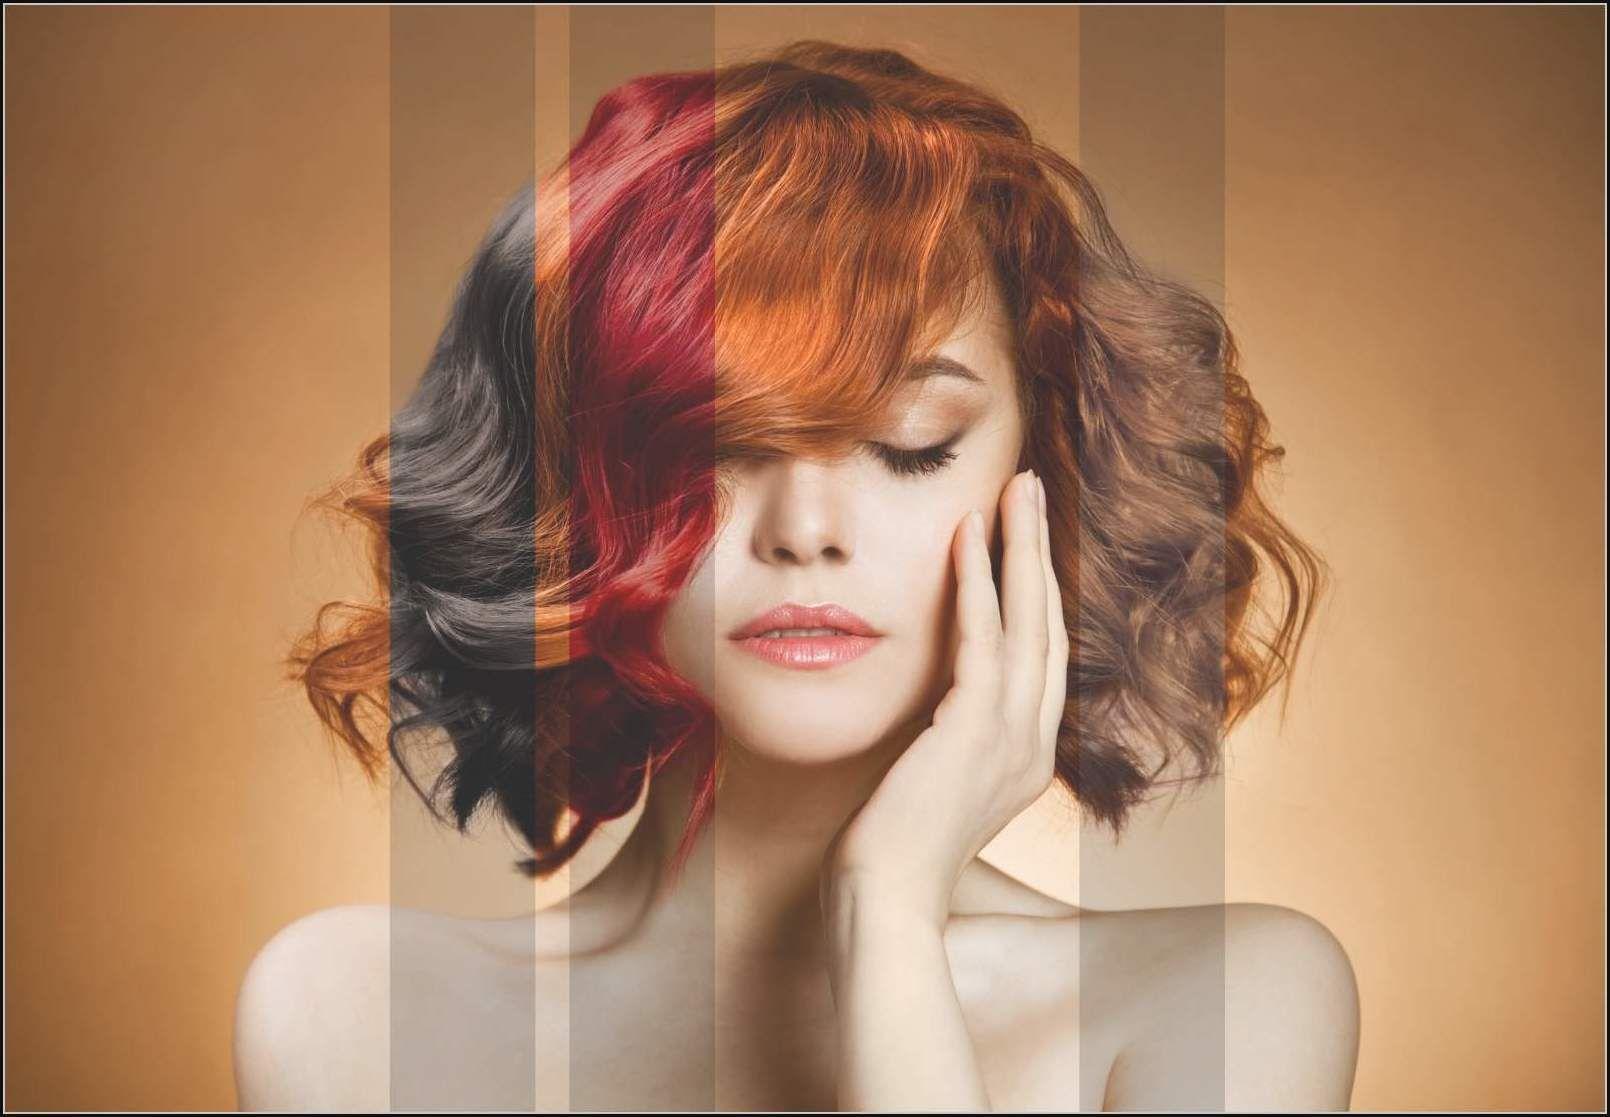 Spezielle Haarfarben 2017 Frisuren Damenfrisuren Bobfrisuren